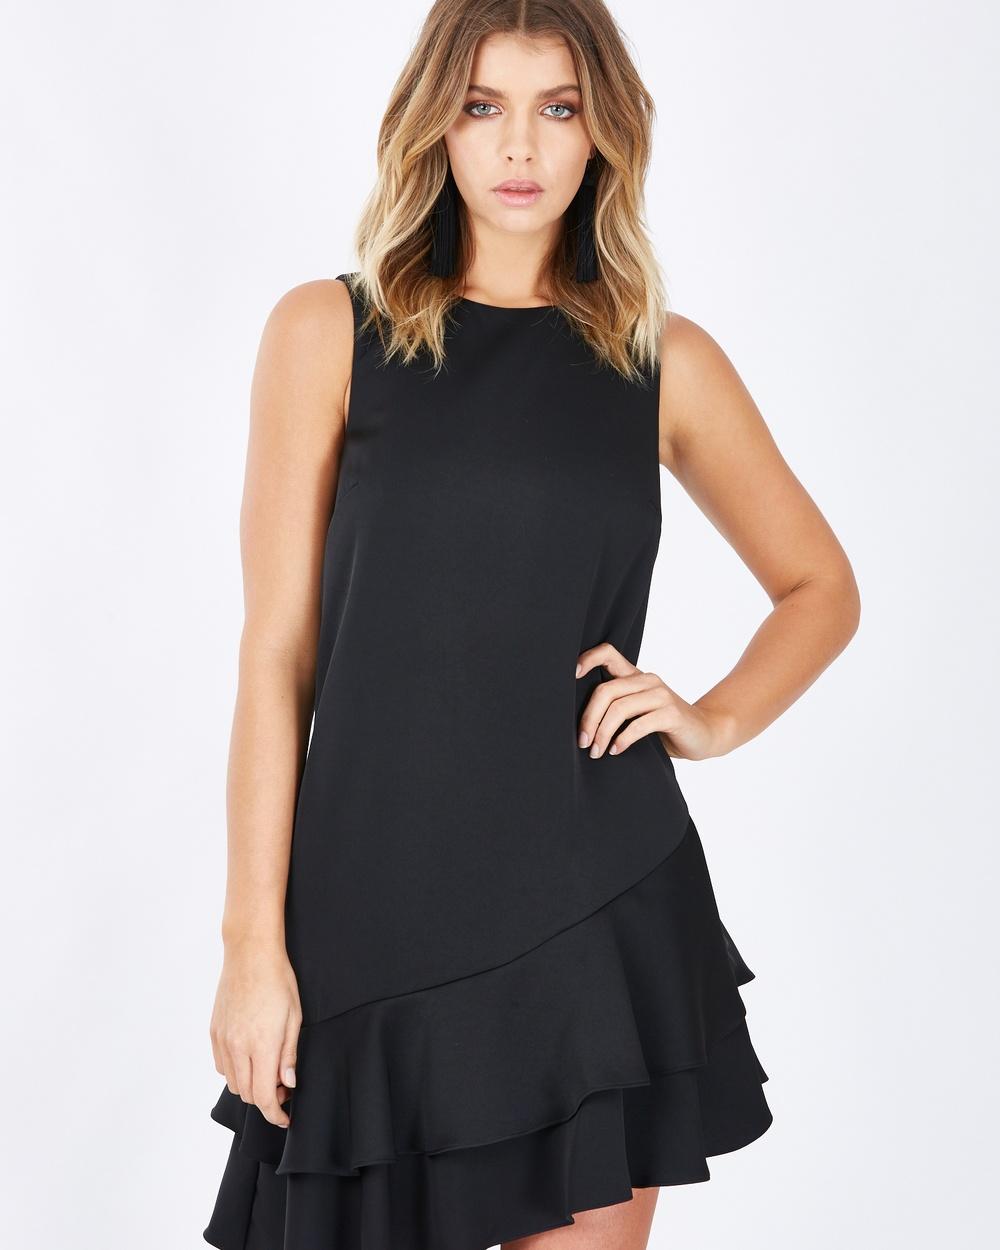 Calli Melina Frill Hem Dress Dresses Black Melina Frill-Hem Dress